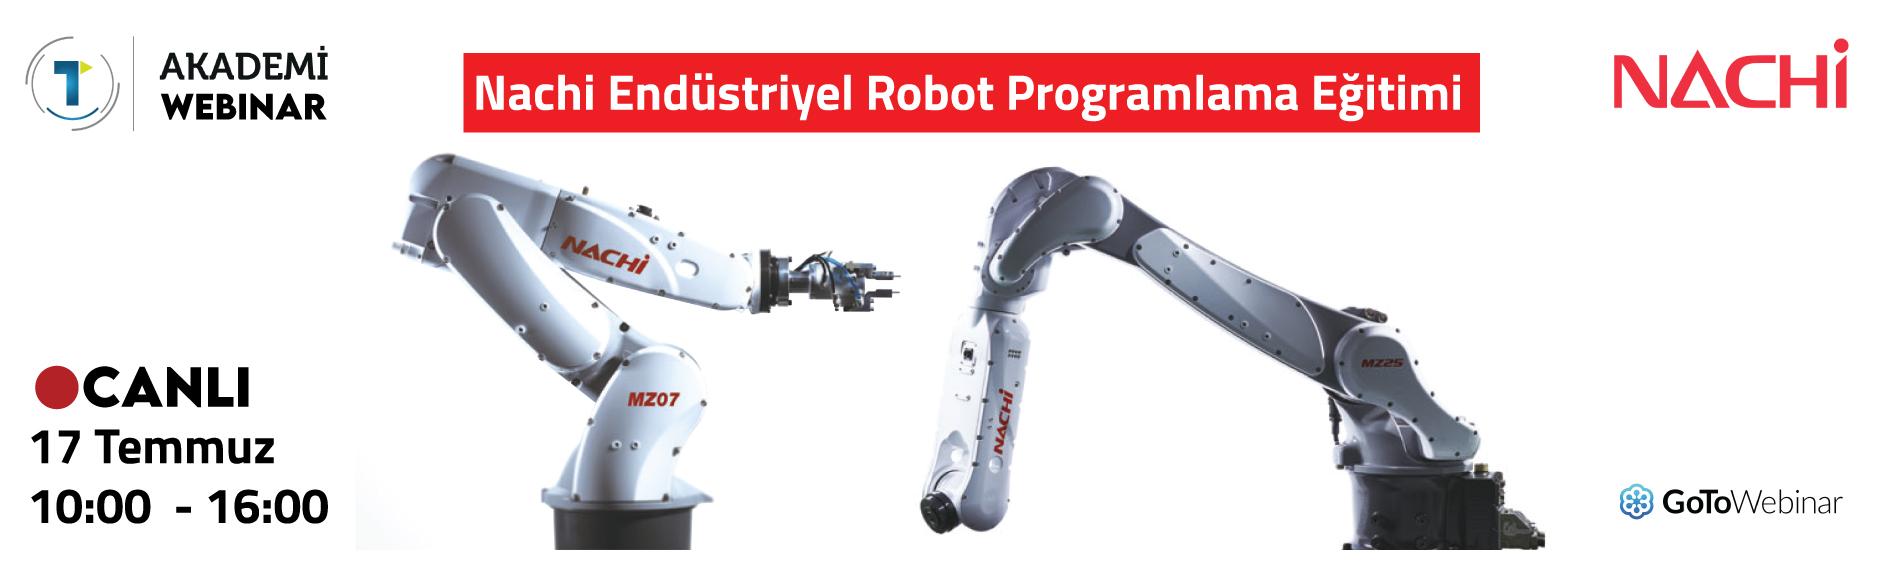 Nachi Endüstriyel Robot Programlama Eğitimi 17 Temmuz